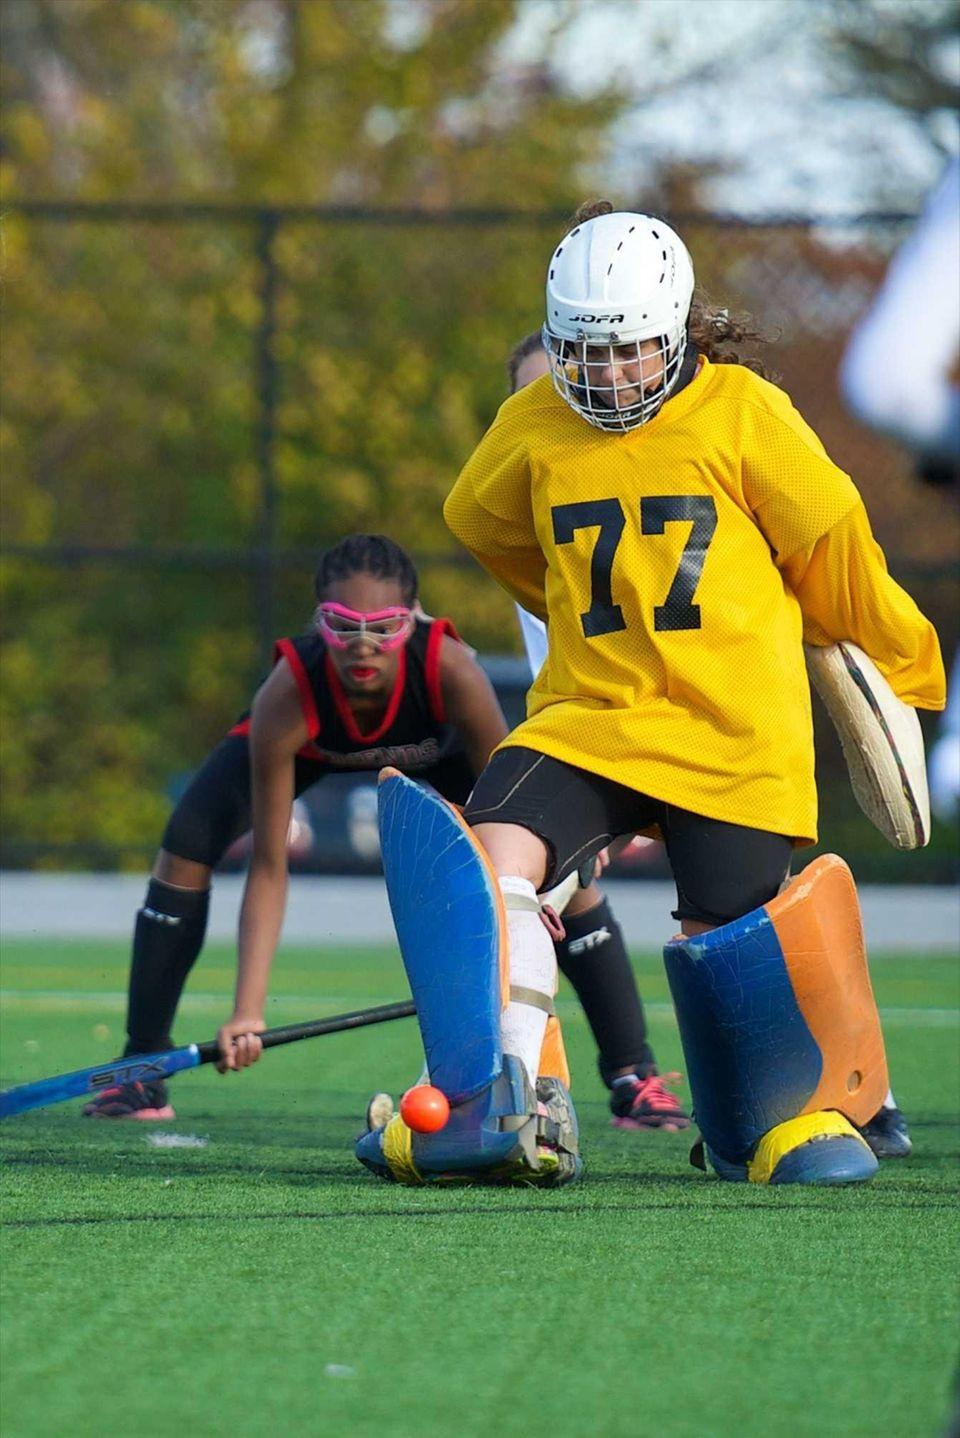 Carle Place goalie Lydia Rice (77) kicks a